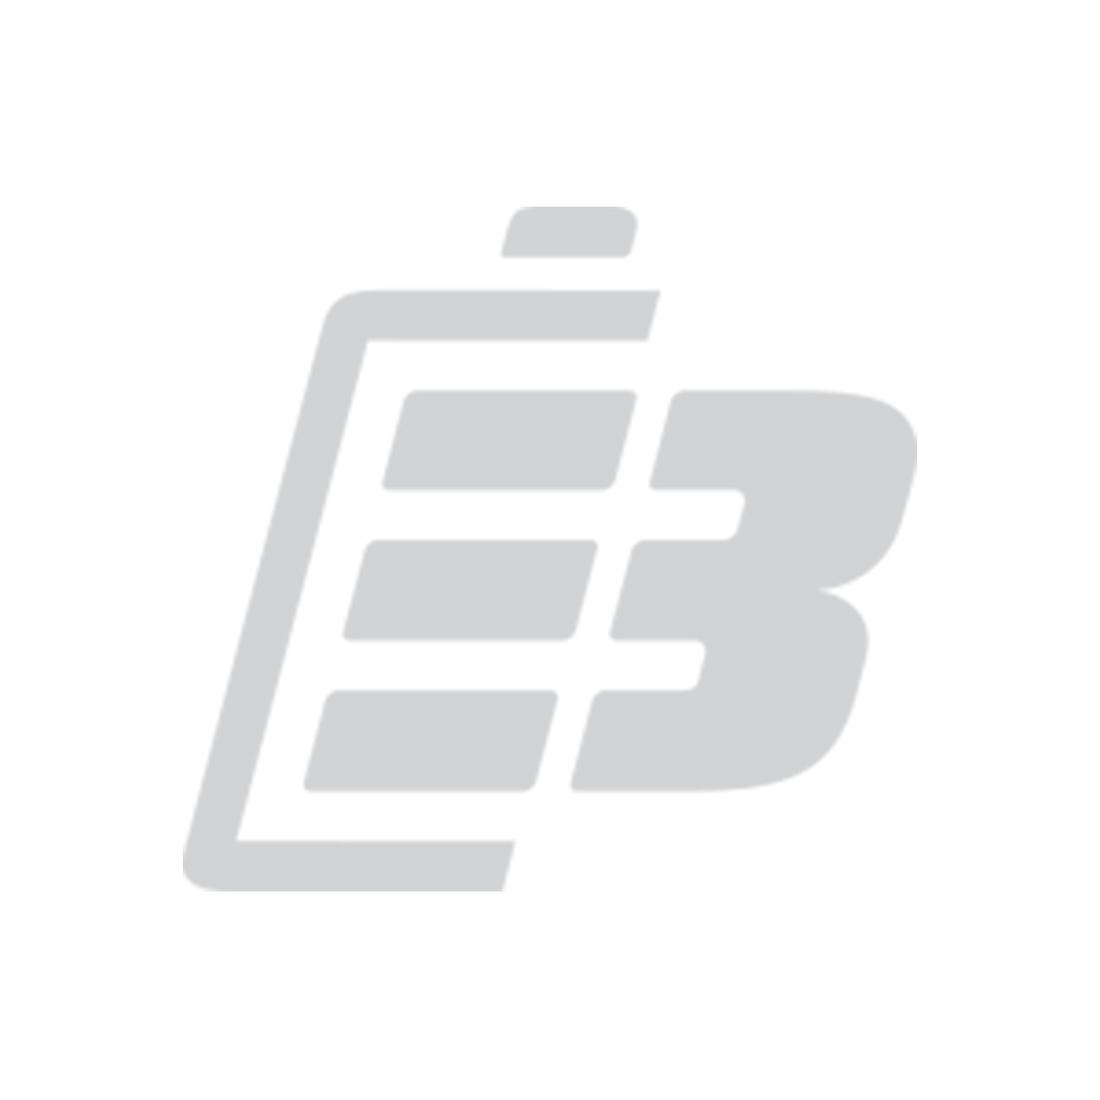 Efest IMR 20700 battery 3100mAh 30A